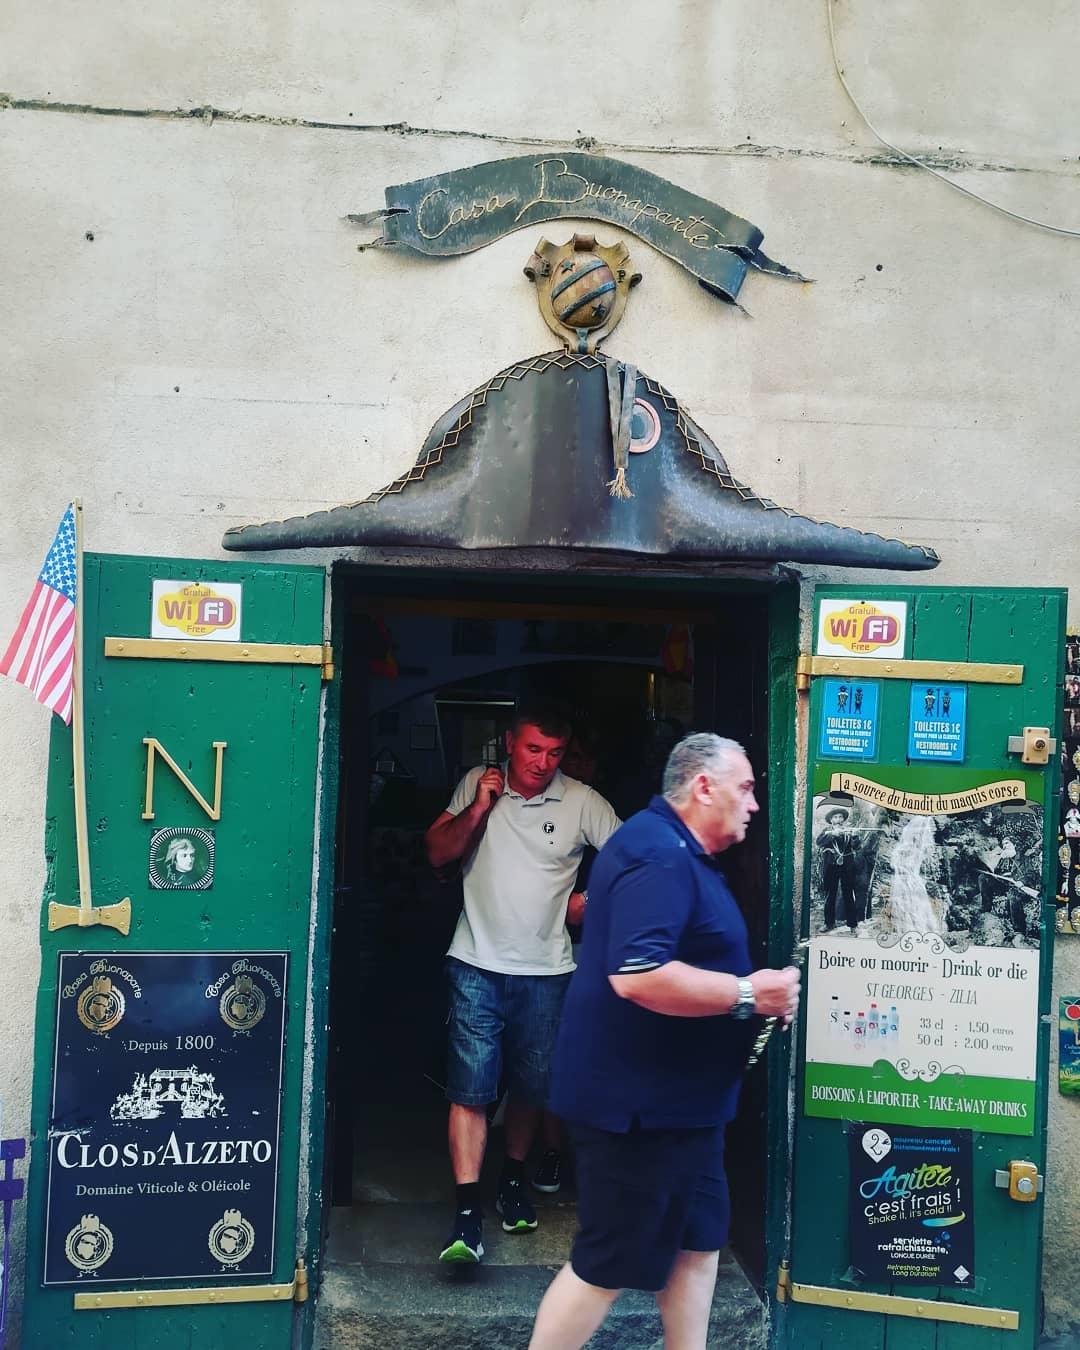 #maisonbonaparte #ajaccio #corsicainsmart #portesdefrance